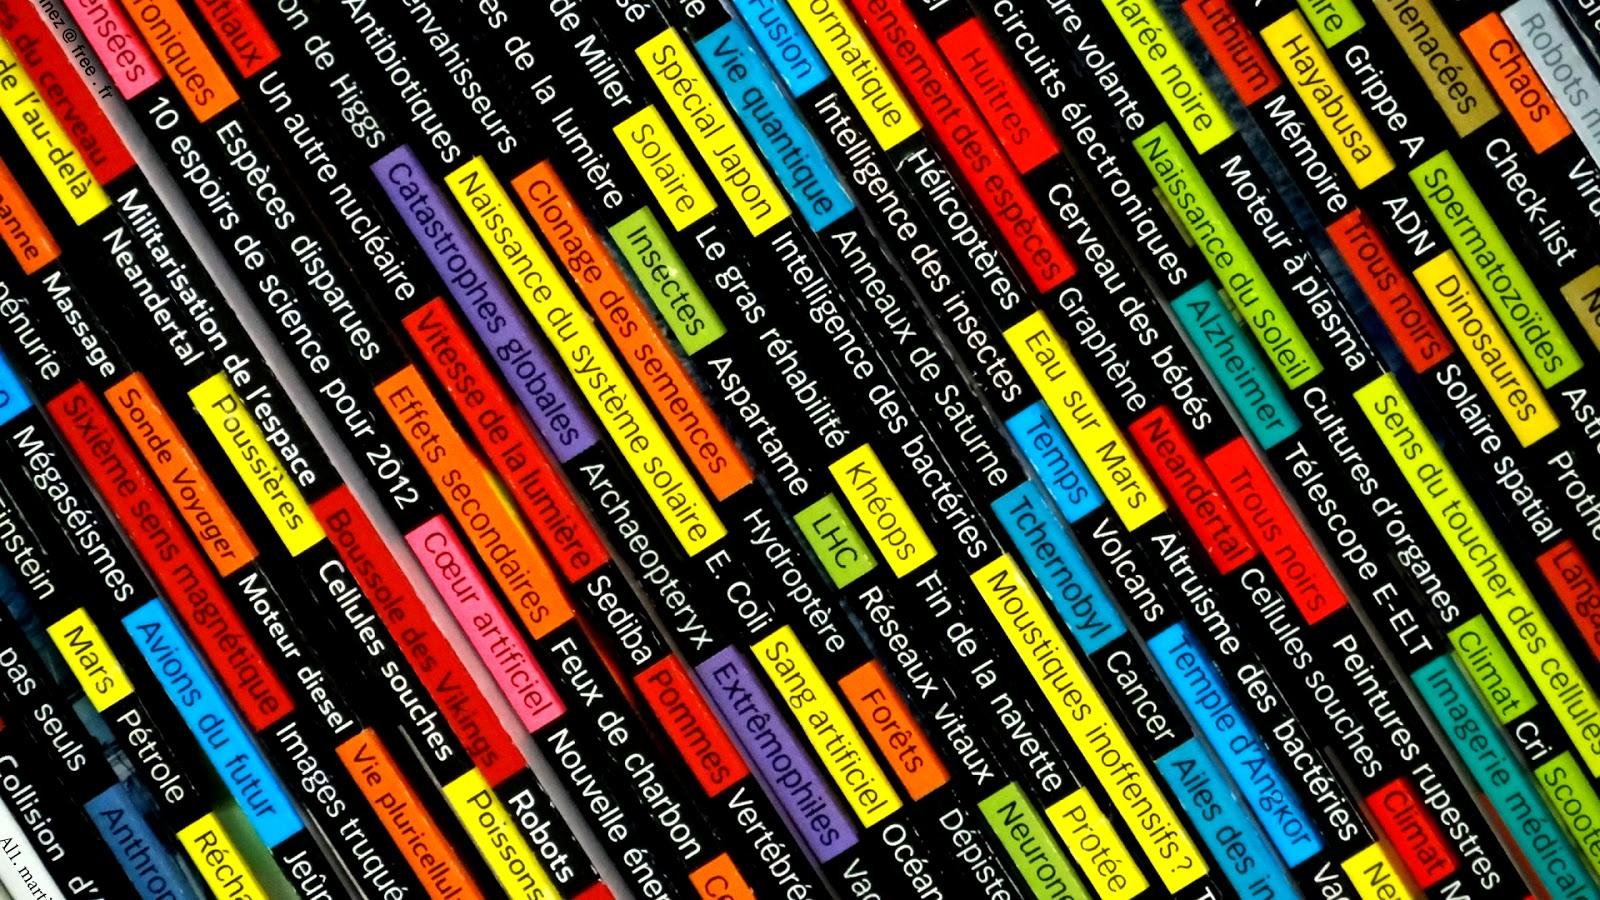 Imagenes zt descarga fondos hd fondo de pantalla for Fondos de pantalla full hd colores